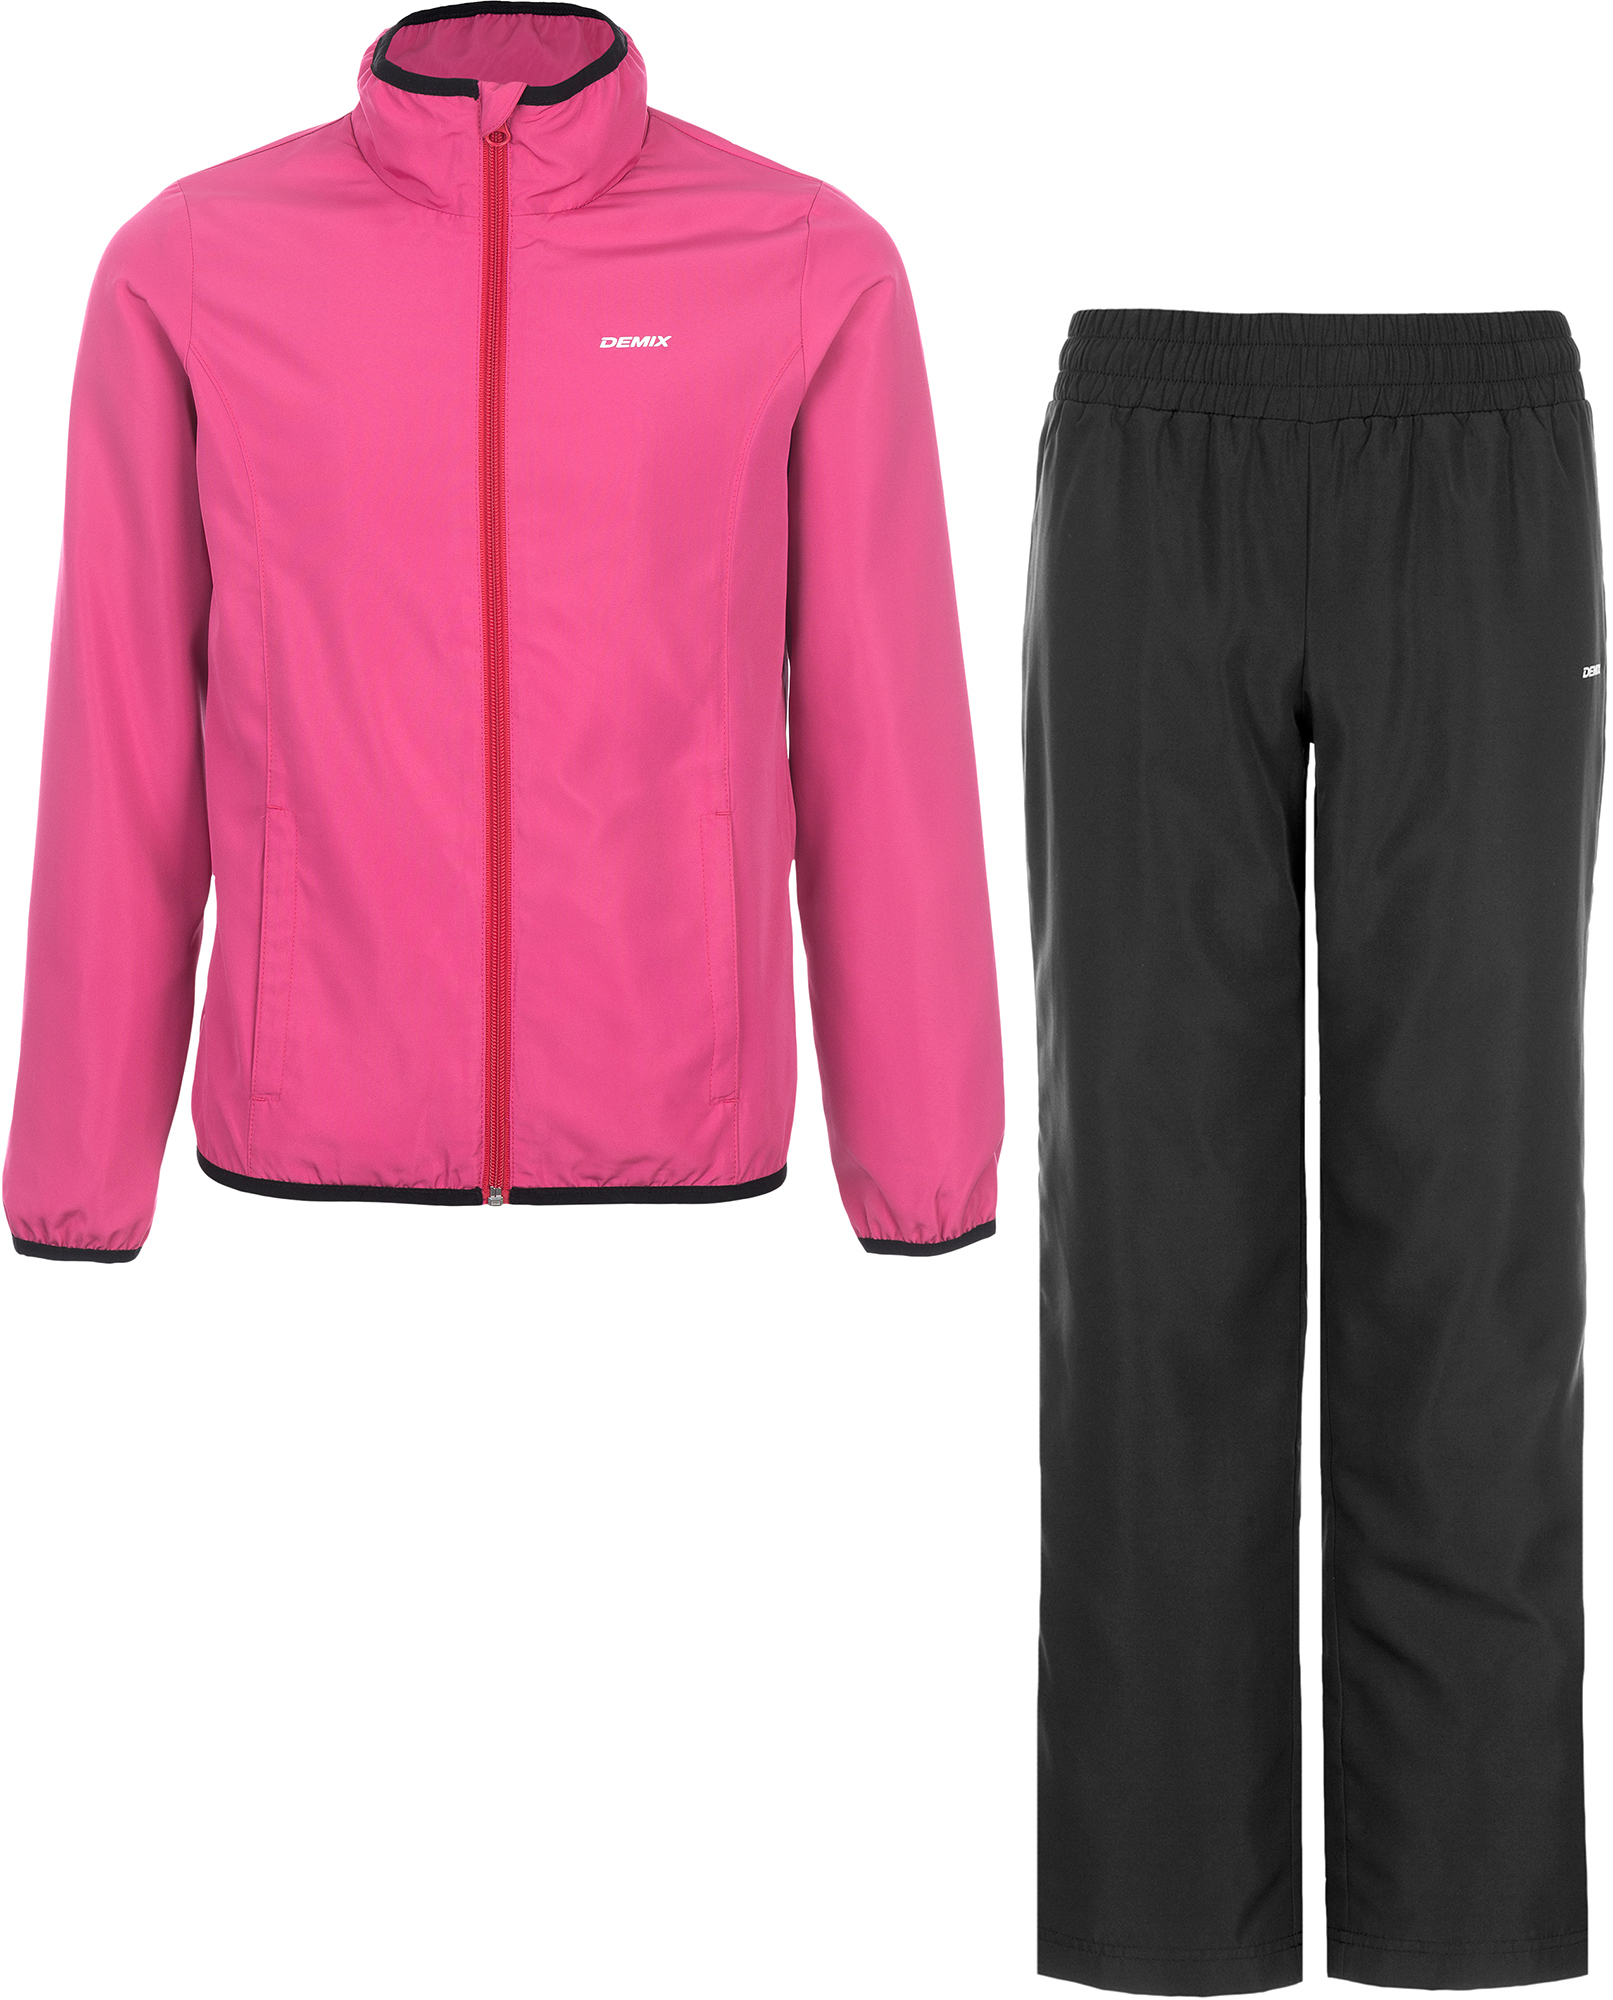 Demix Детский спортивный костюм Demix, размер 164 детский костюм ngggn n855t80031 2015